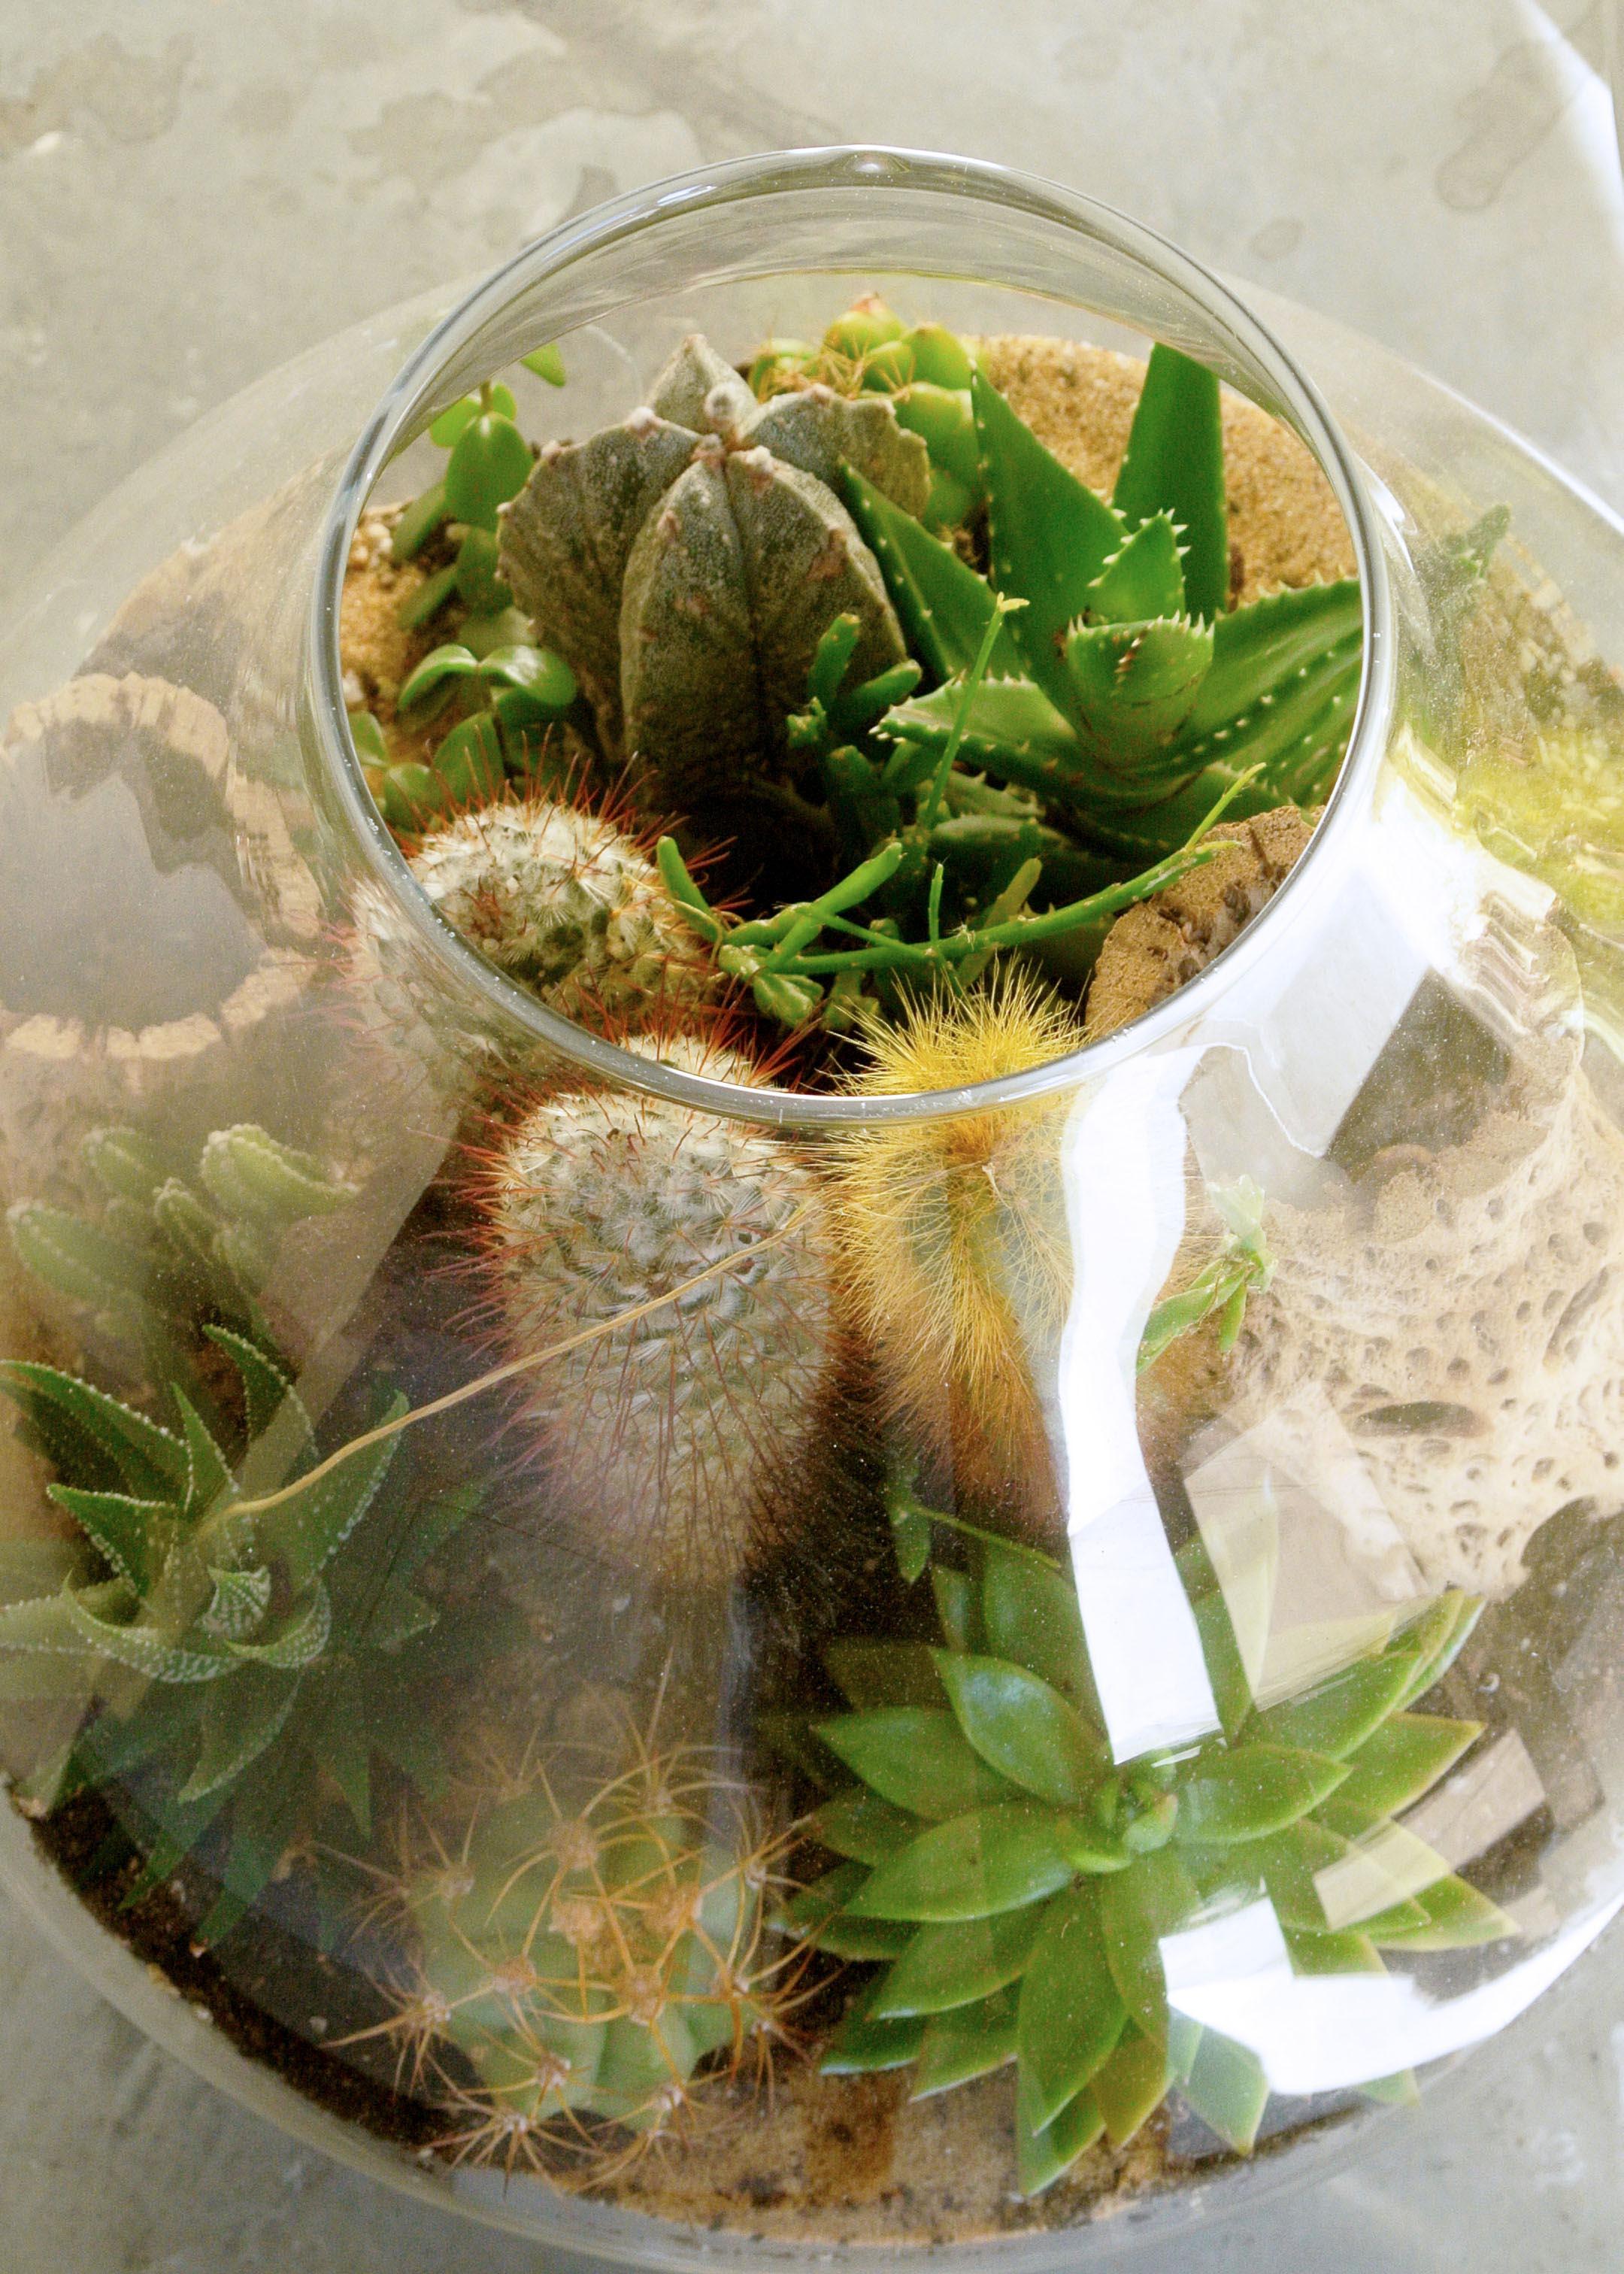 One On One Succulent Terrarium Building Workshop Megan George The Zen Succulent Durham S Neighborhood Plant Gift Shop